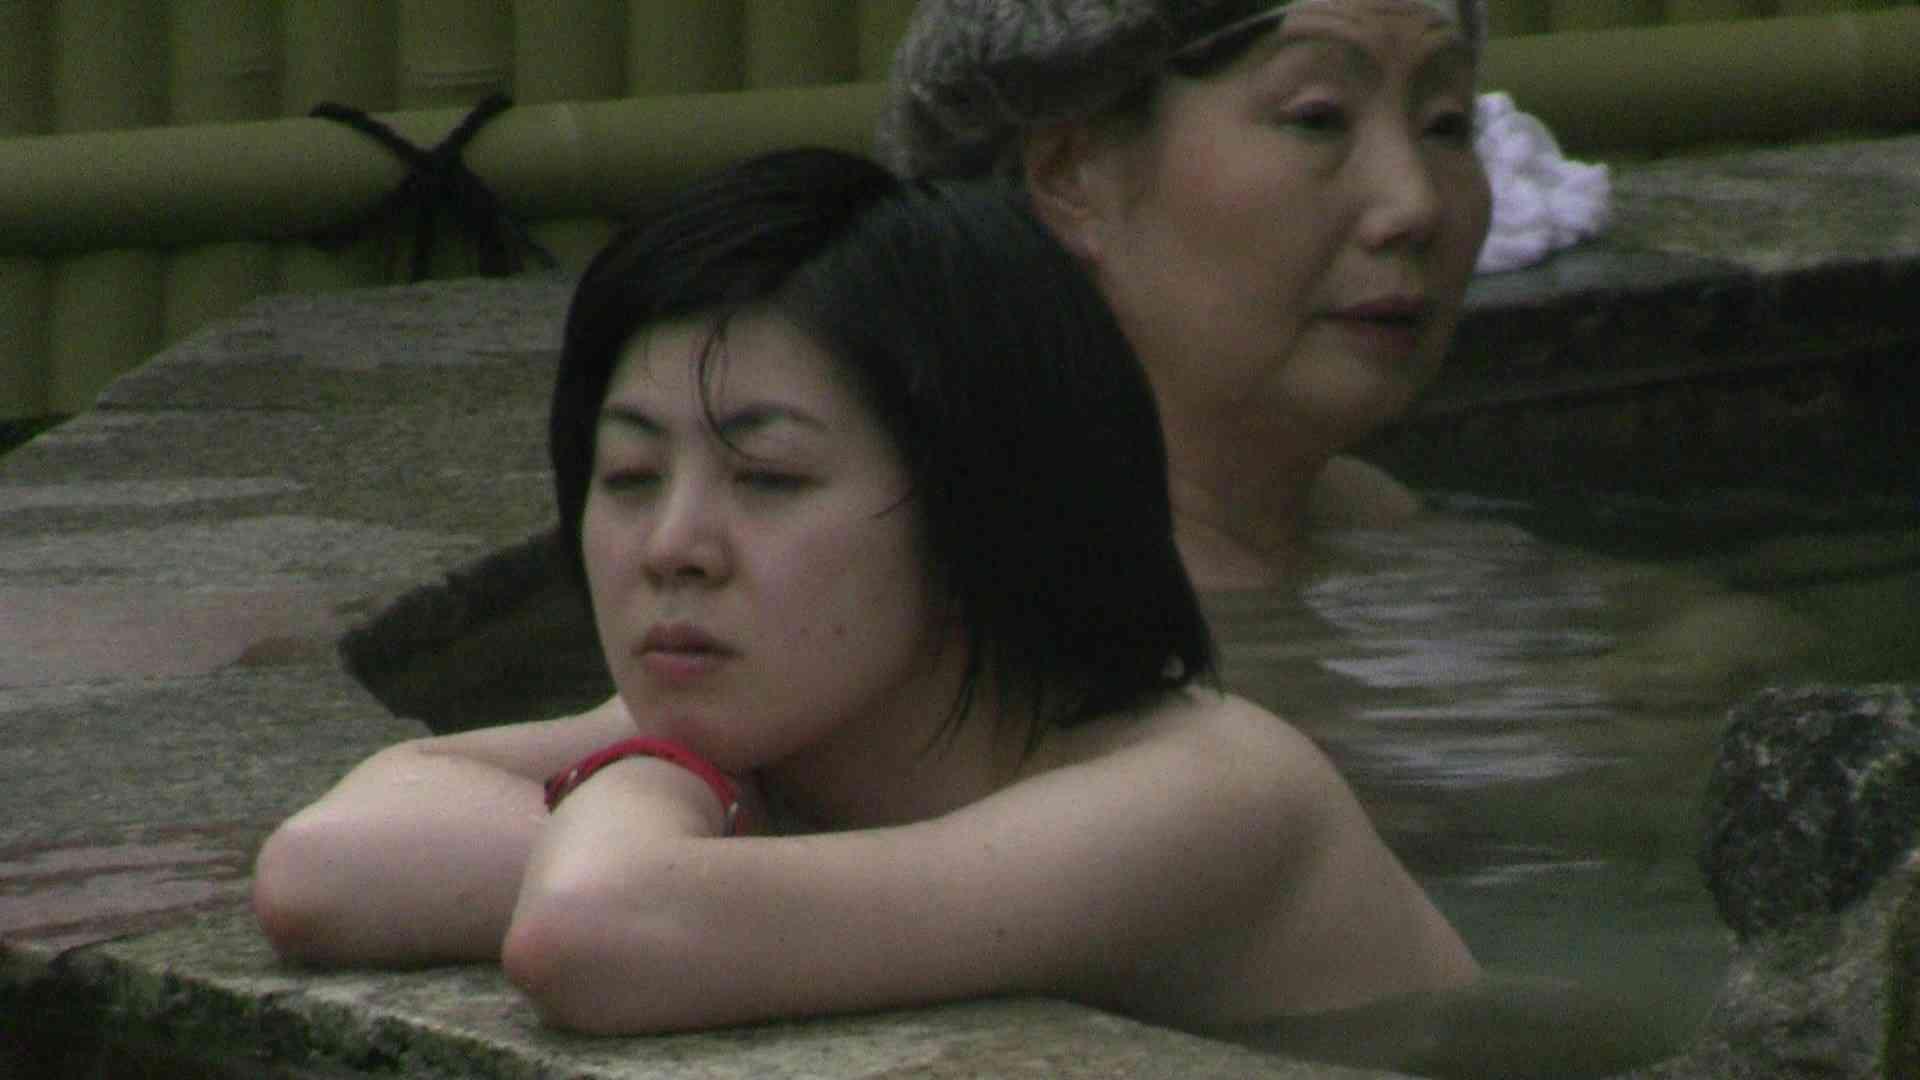 Aquaな露天風呂Vol.685 盗撮シリーズ | 露天風呂編  95PIX 13